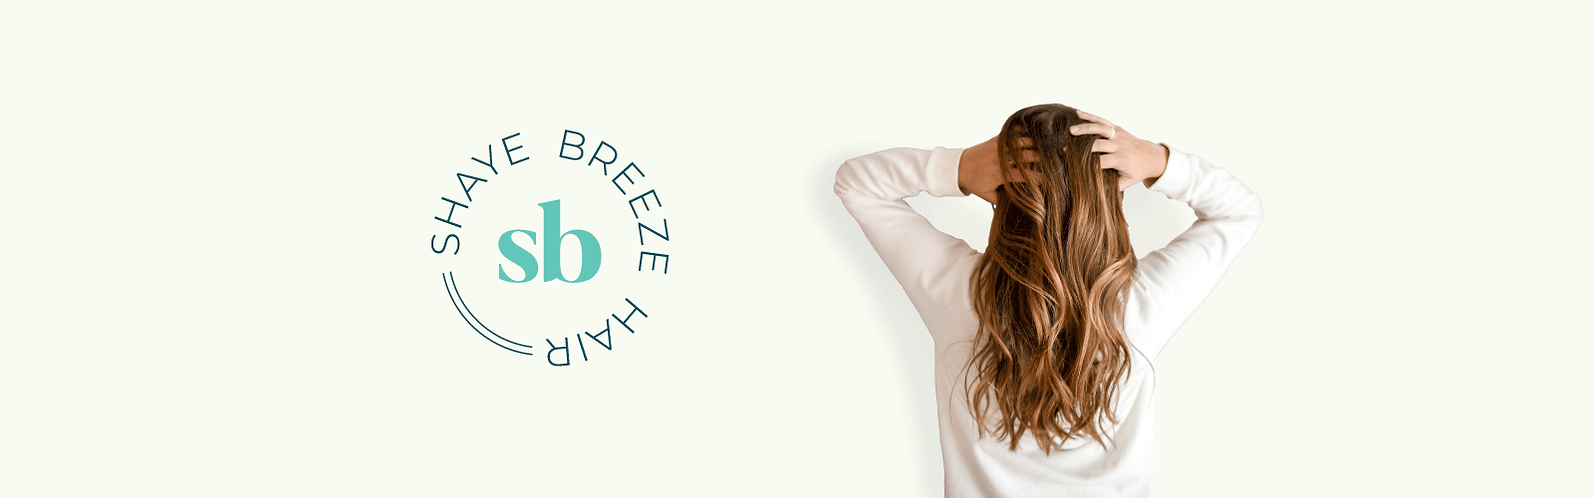 shaye breeze hair brand identity banner